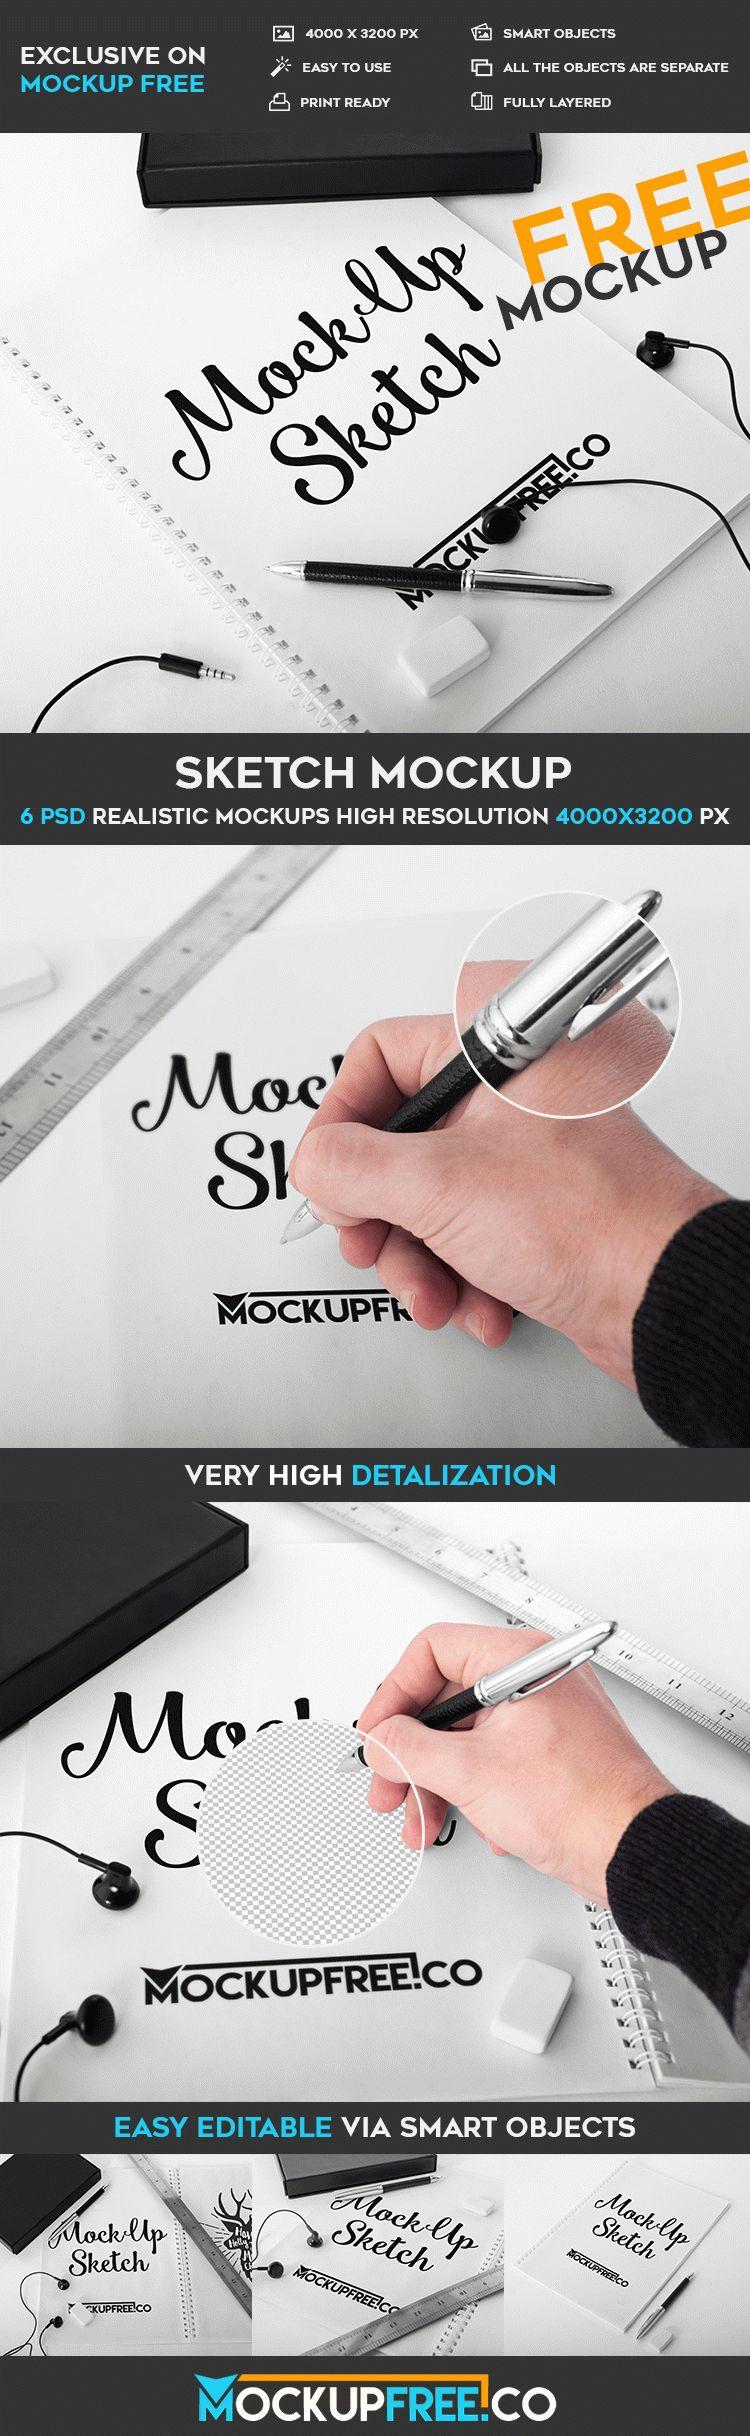 Sketch - 6 Free PSD Mockups